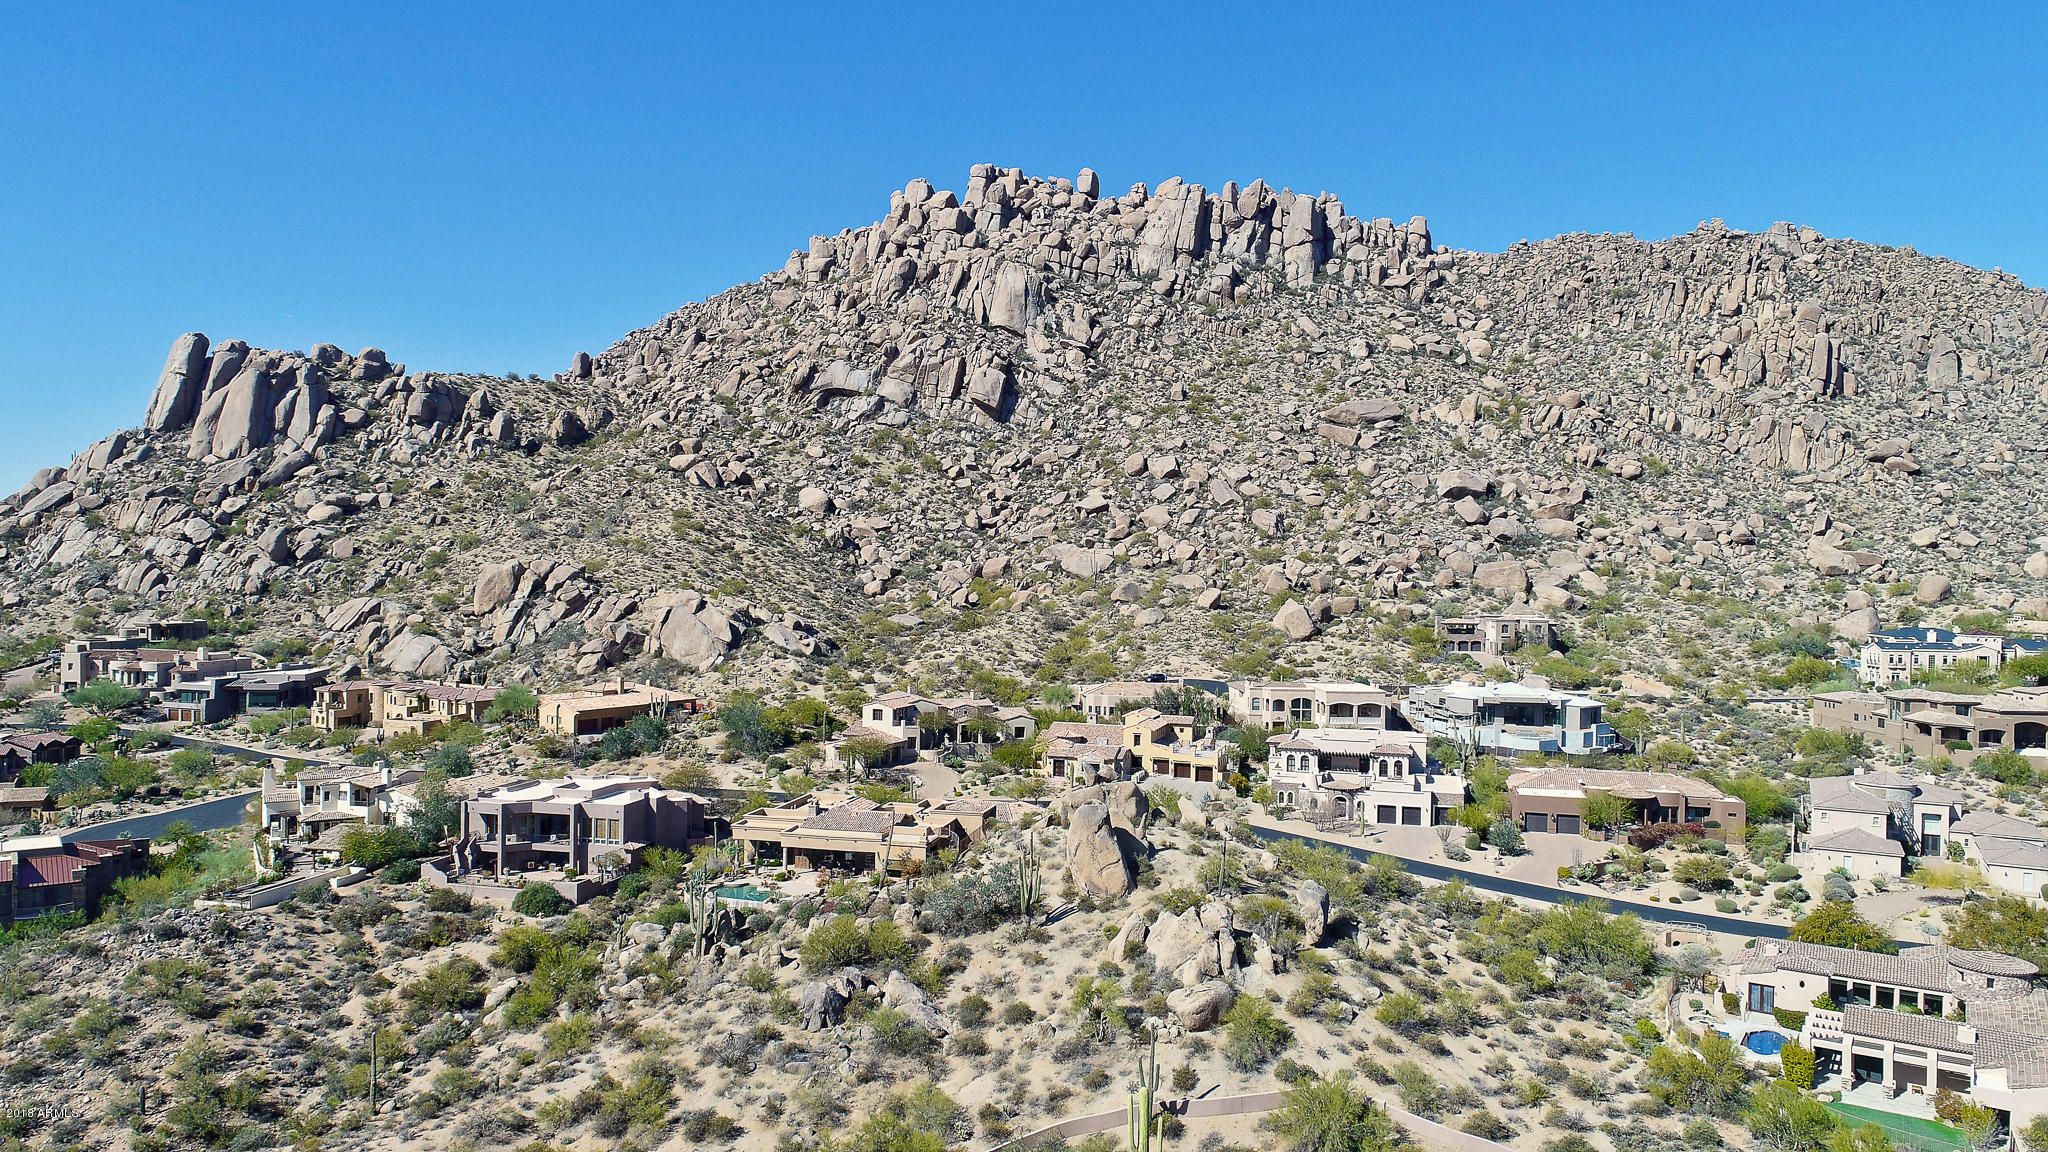 MLS 5828684 25357 N 113TH Way, Scottsdale, AZ 85255 Scottsdale AZ Troon Village